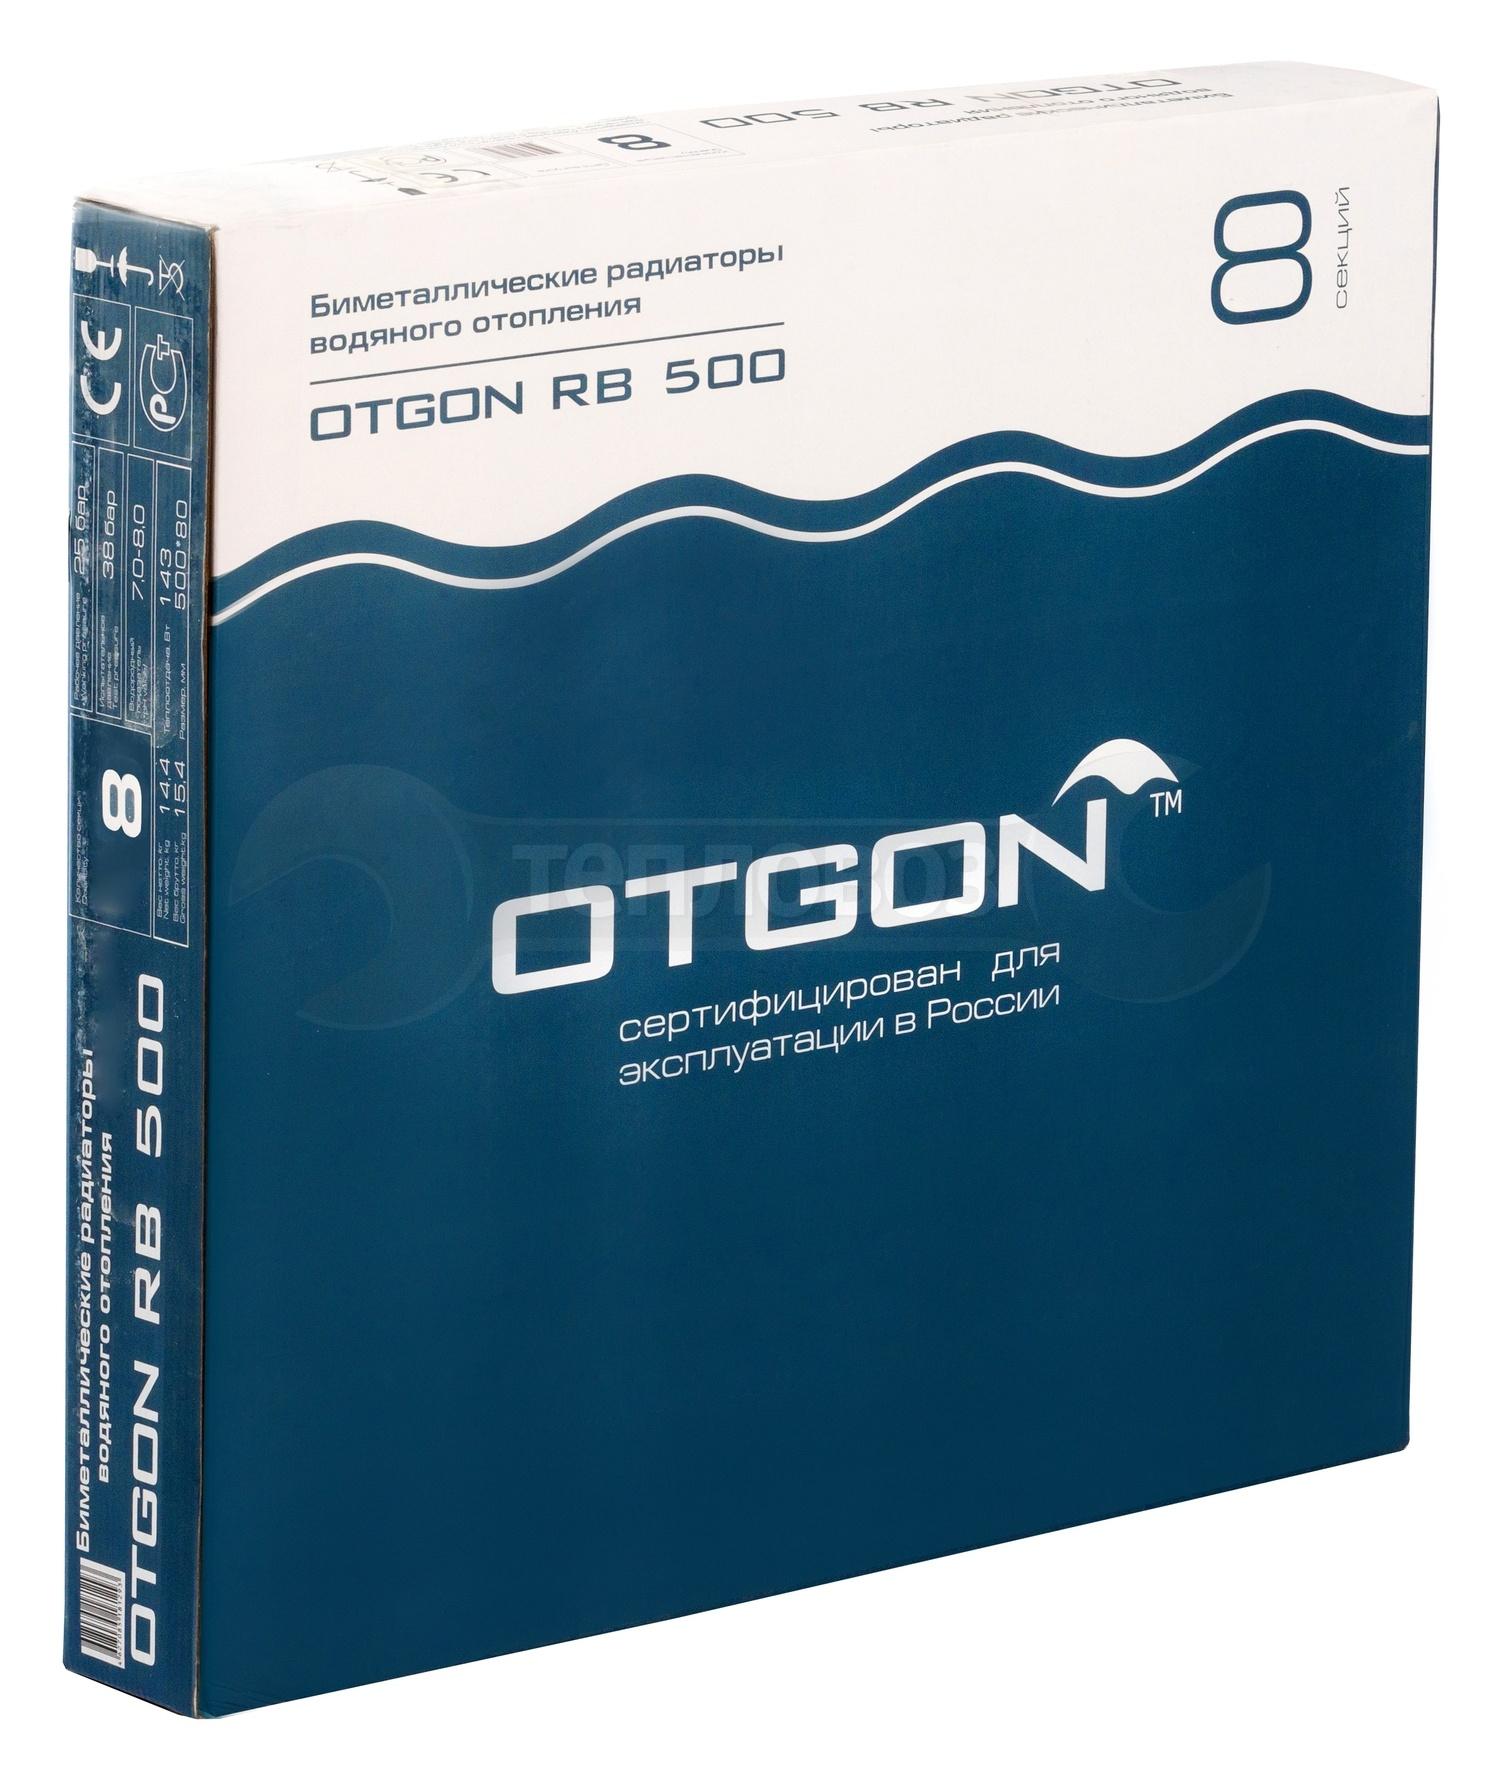 OTGON RB 500, 8 секций